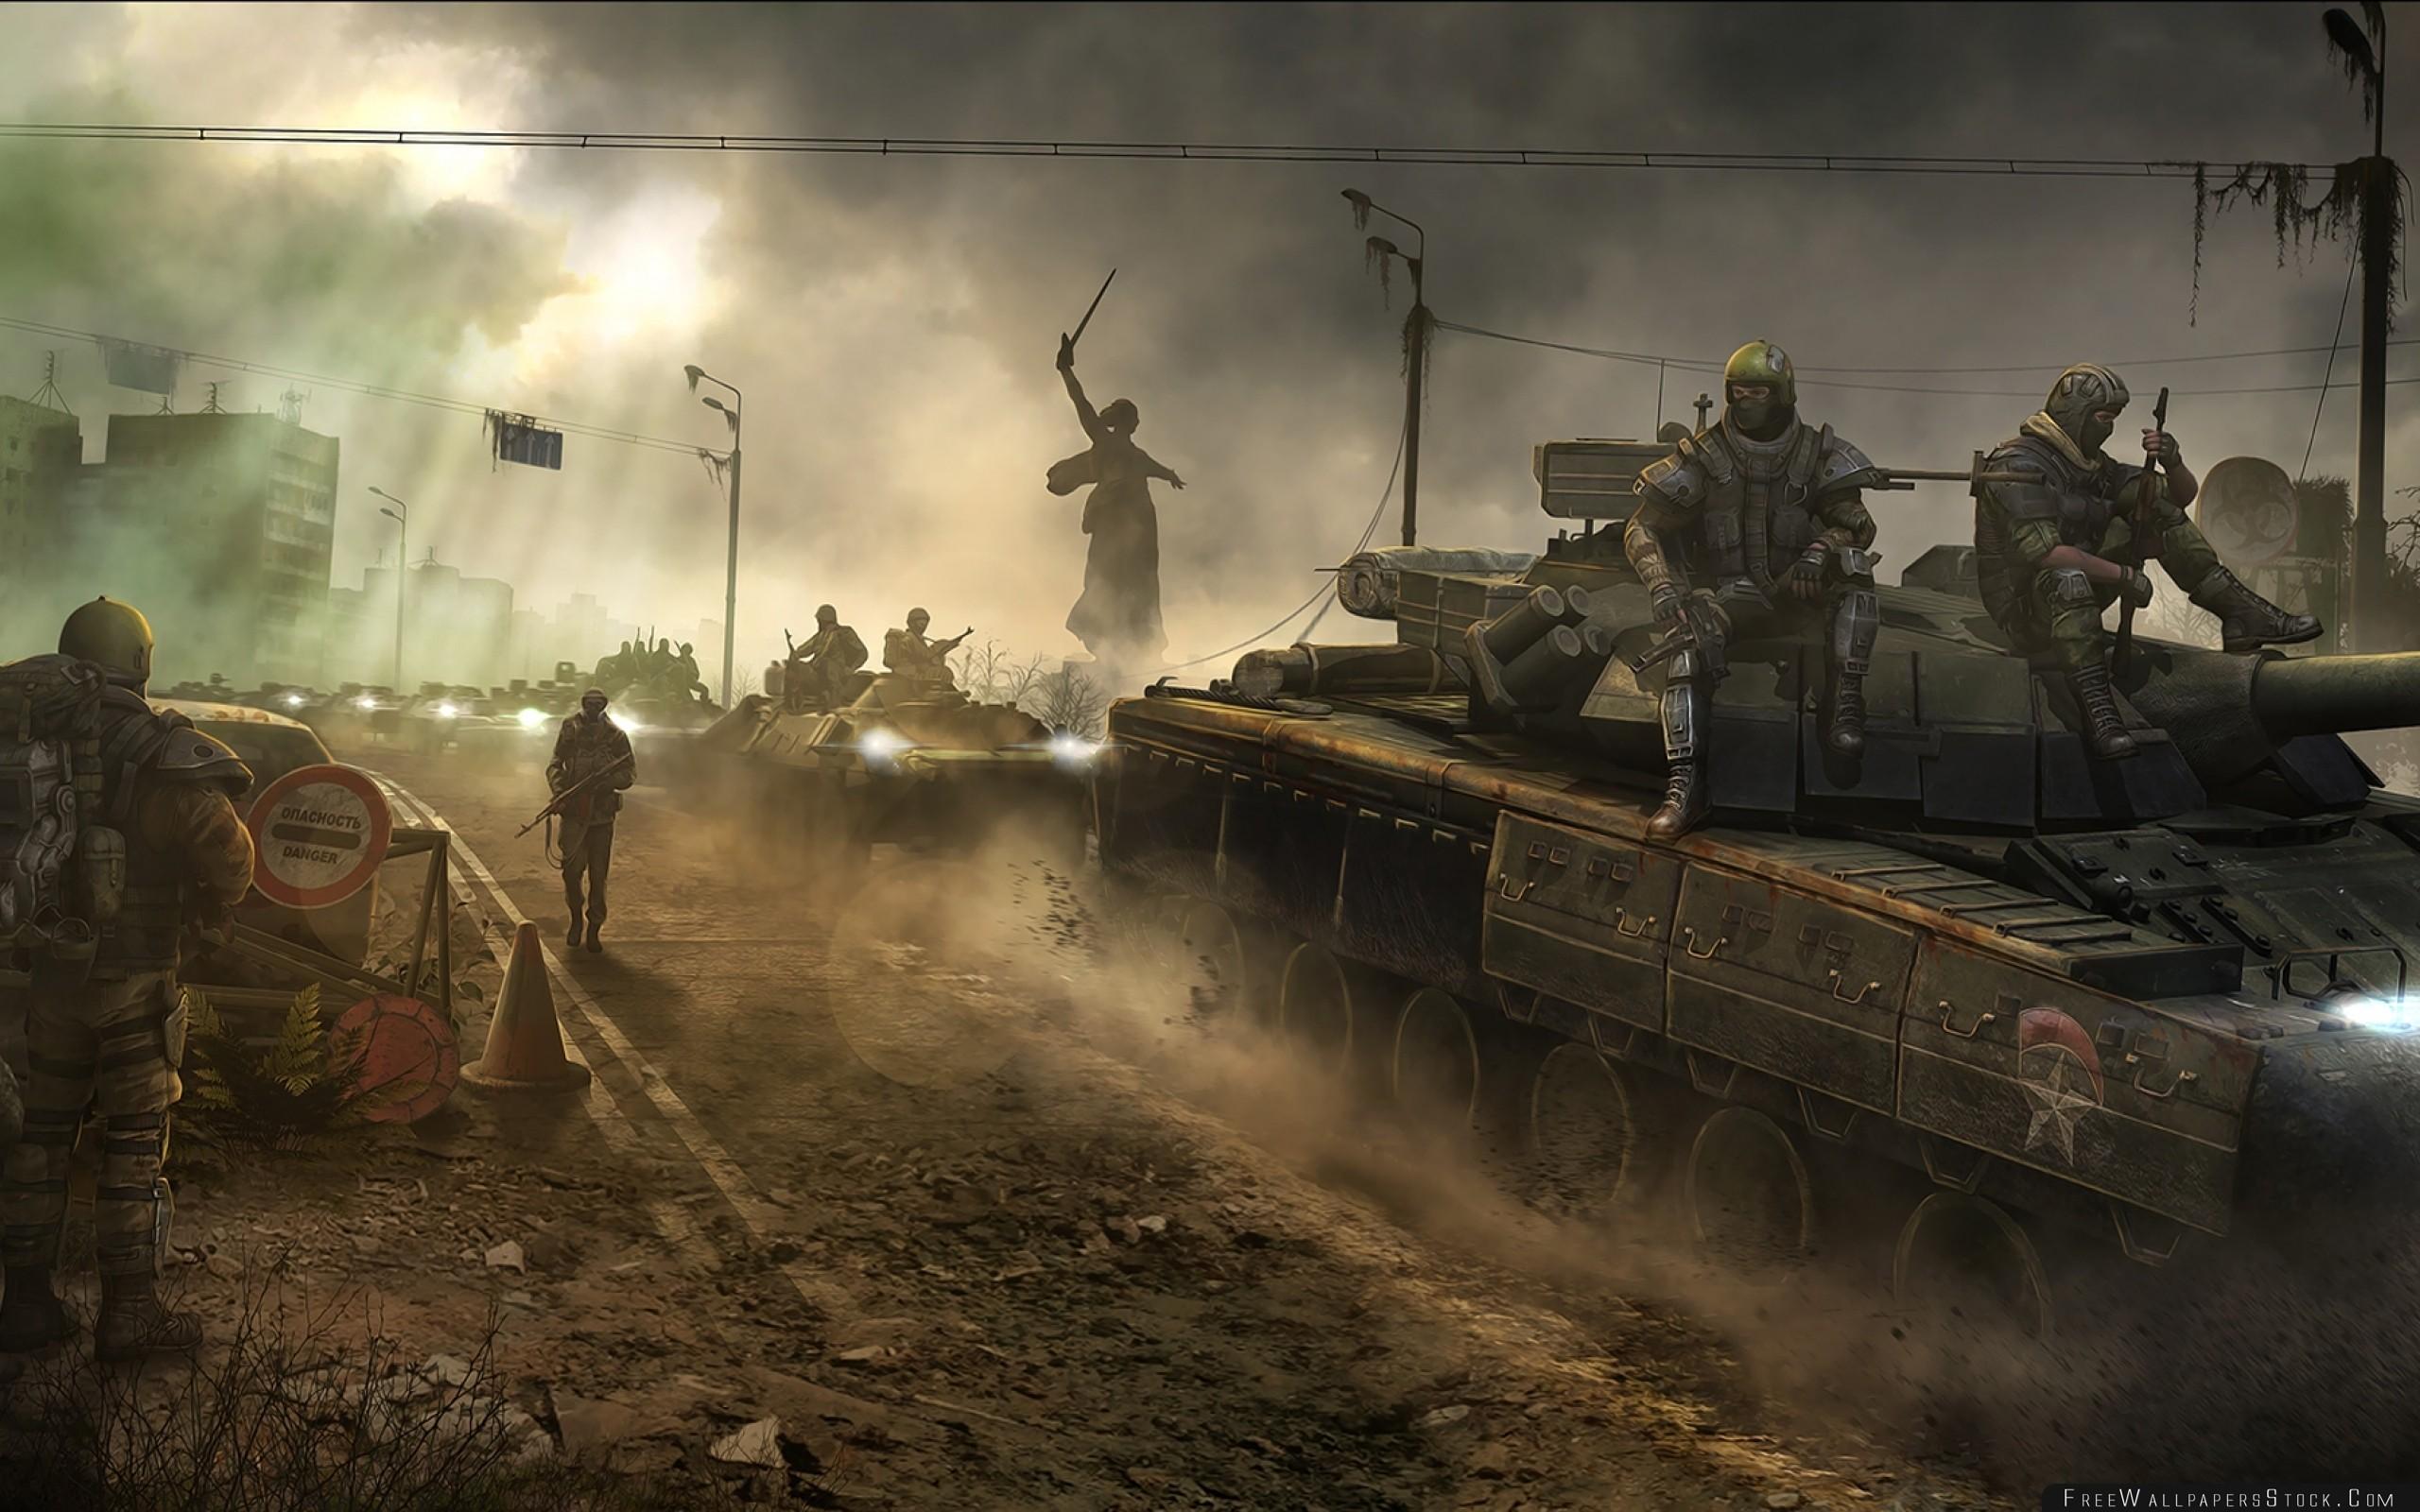 Download Free Wallpaper Survarium Soldiers War Survival Areas Tanks Stalkers